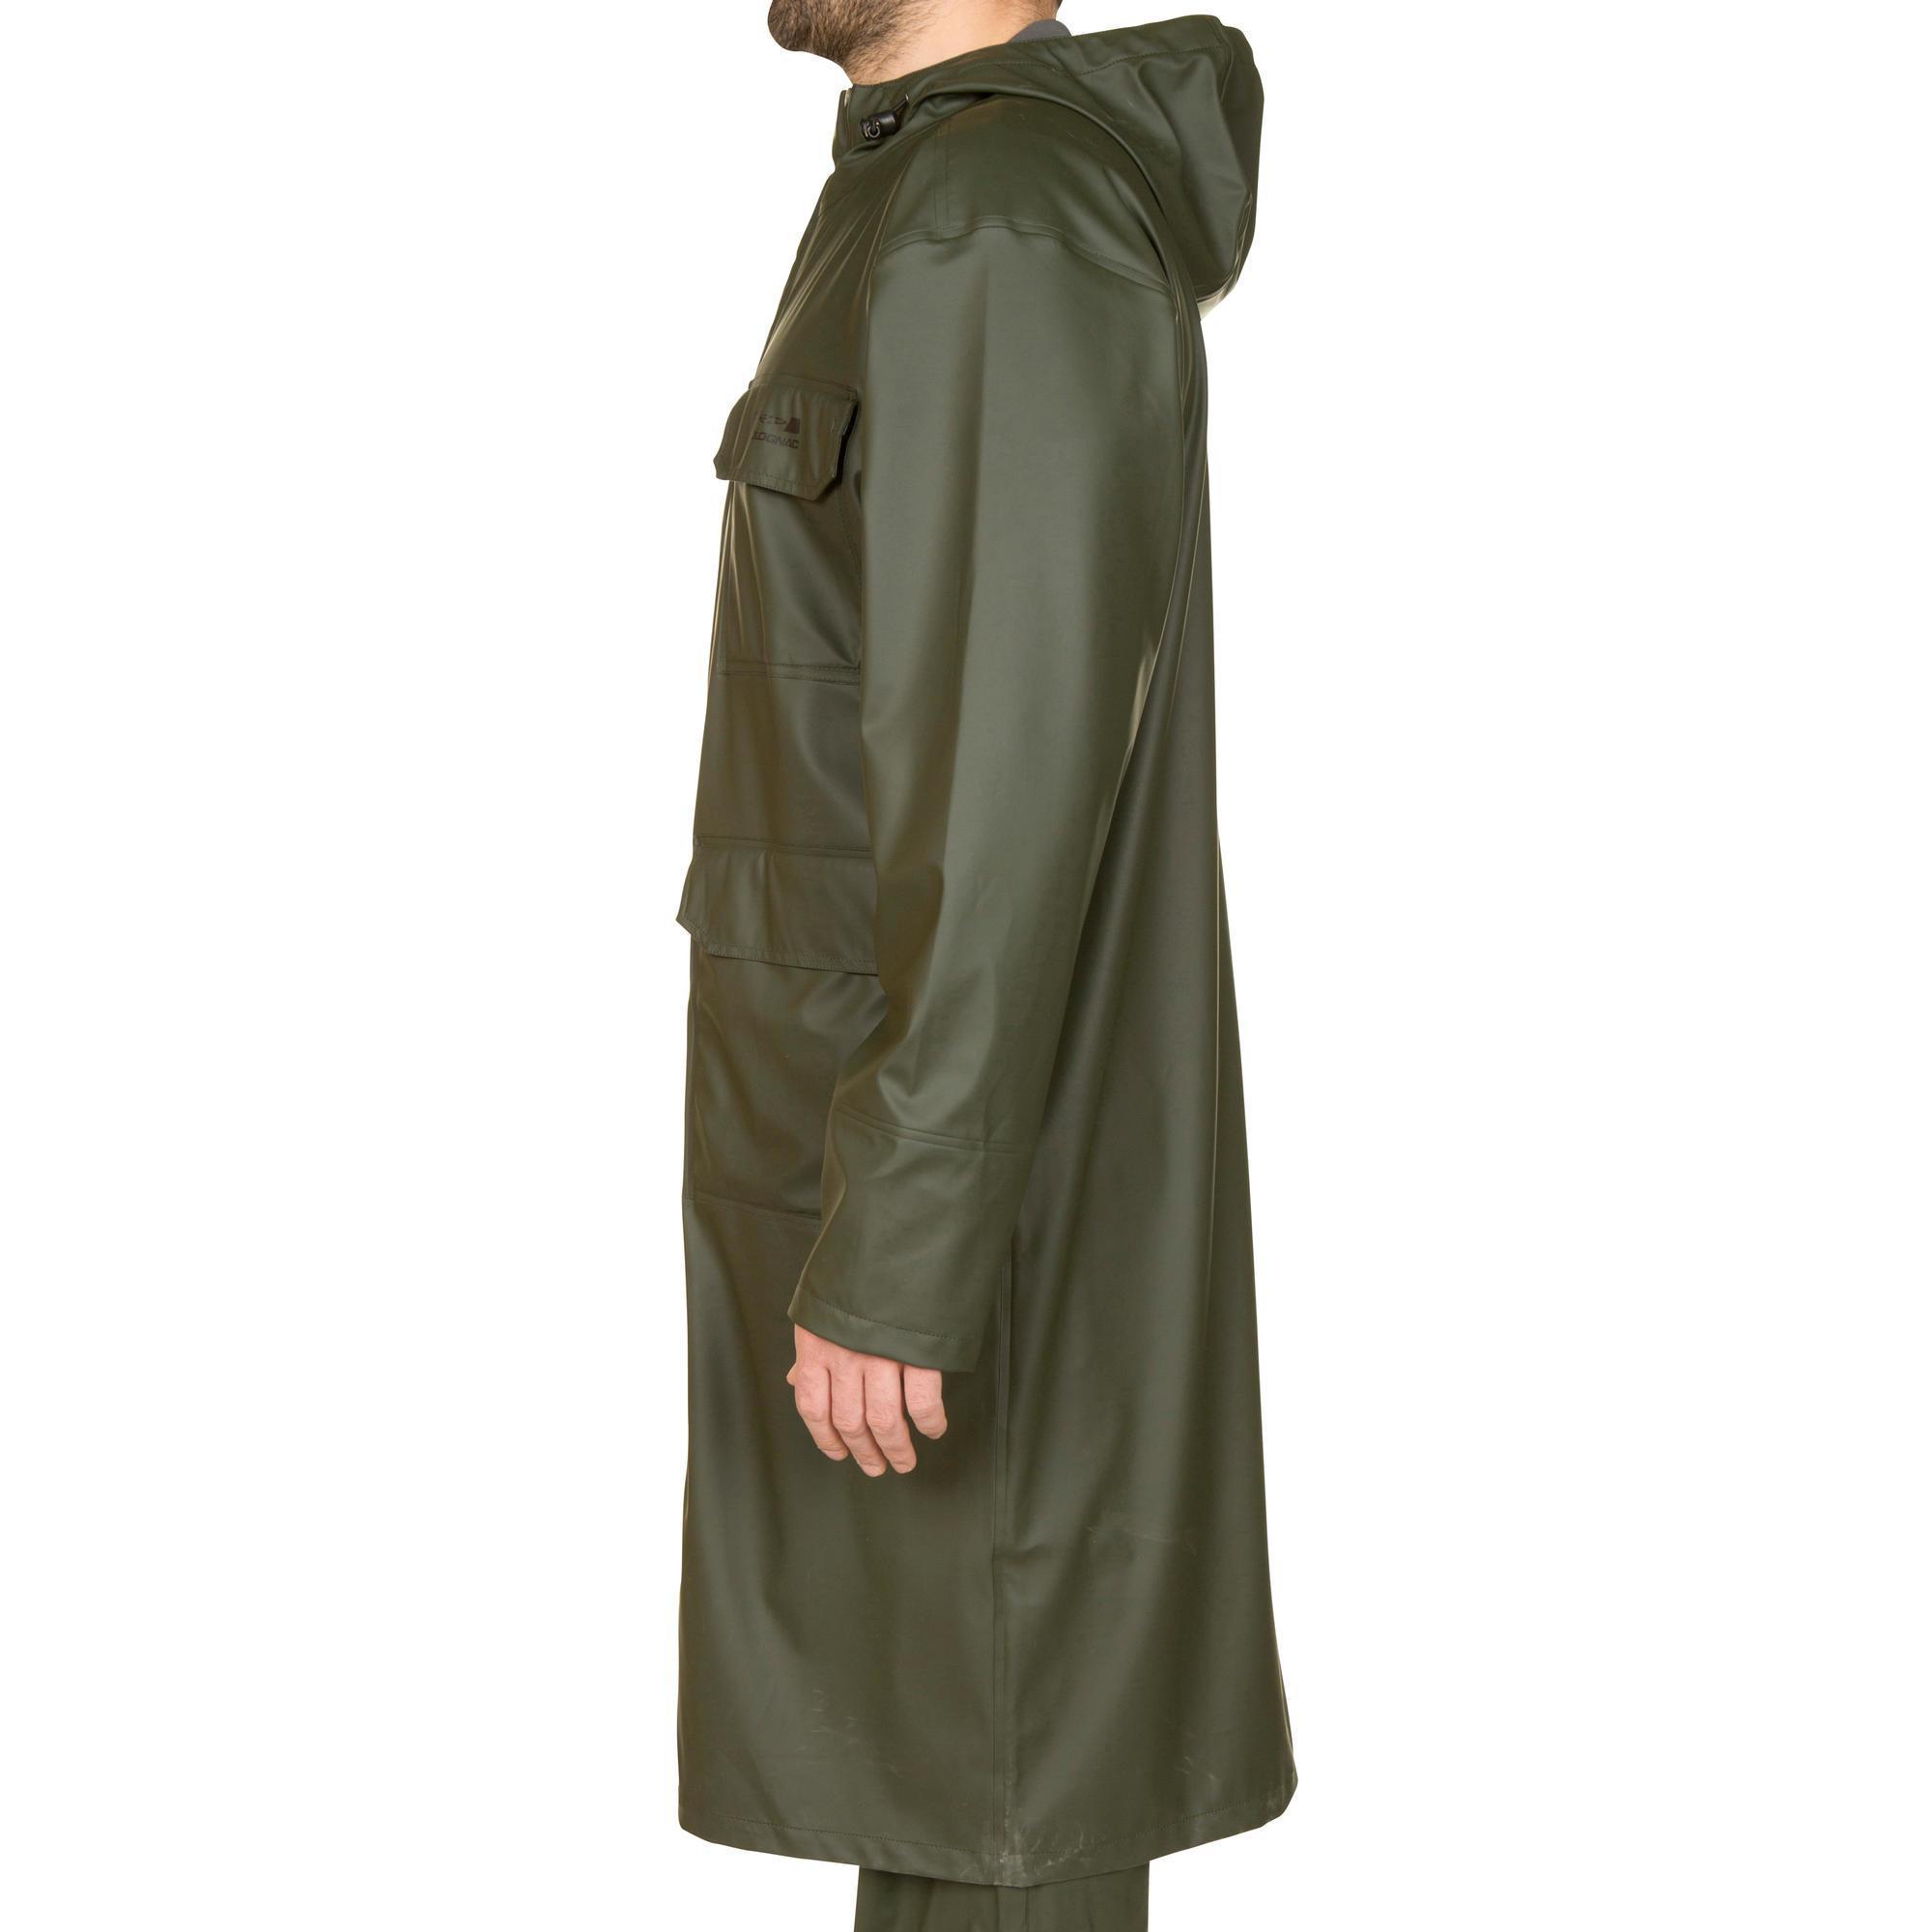 Manteau long femme decathlon